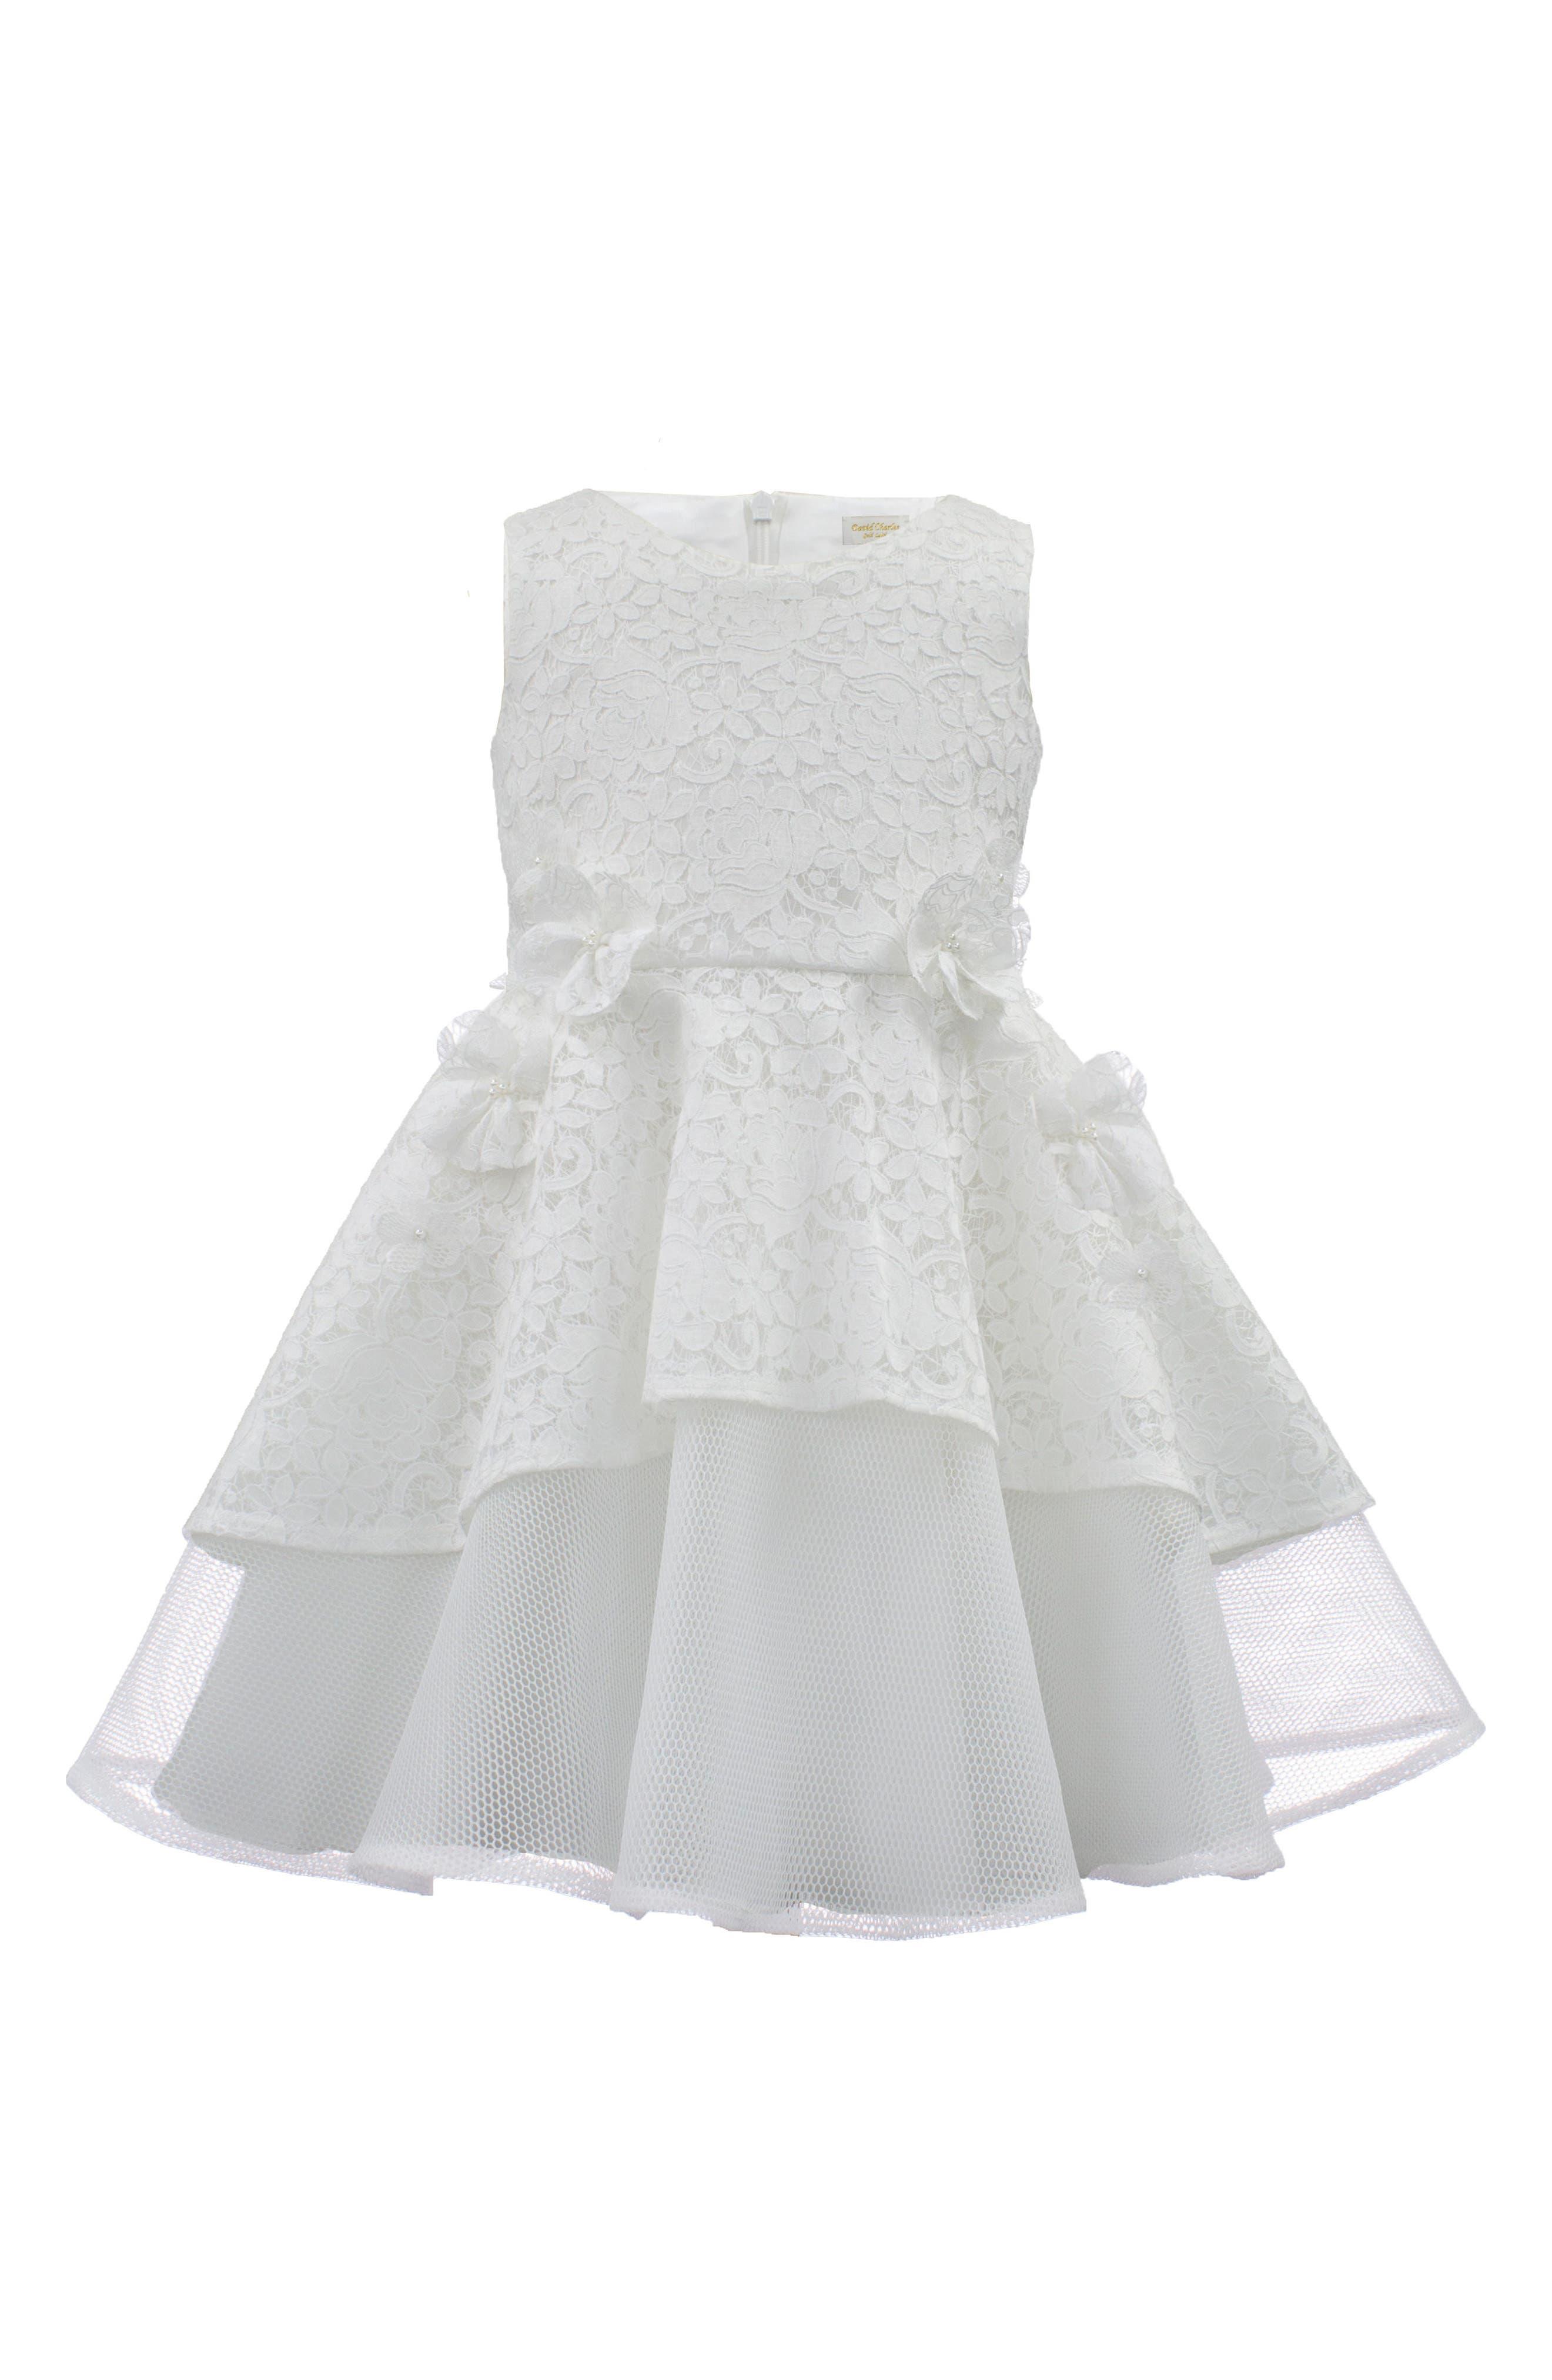 David Charles Lace & Techno Mesh Dress (Toddler Girls, Little Girls & Big Girls)